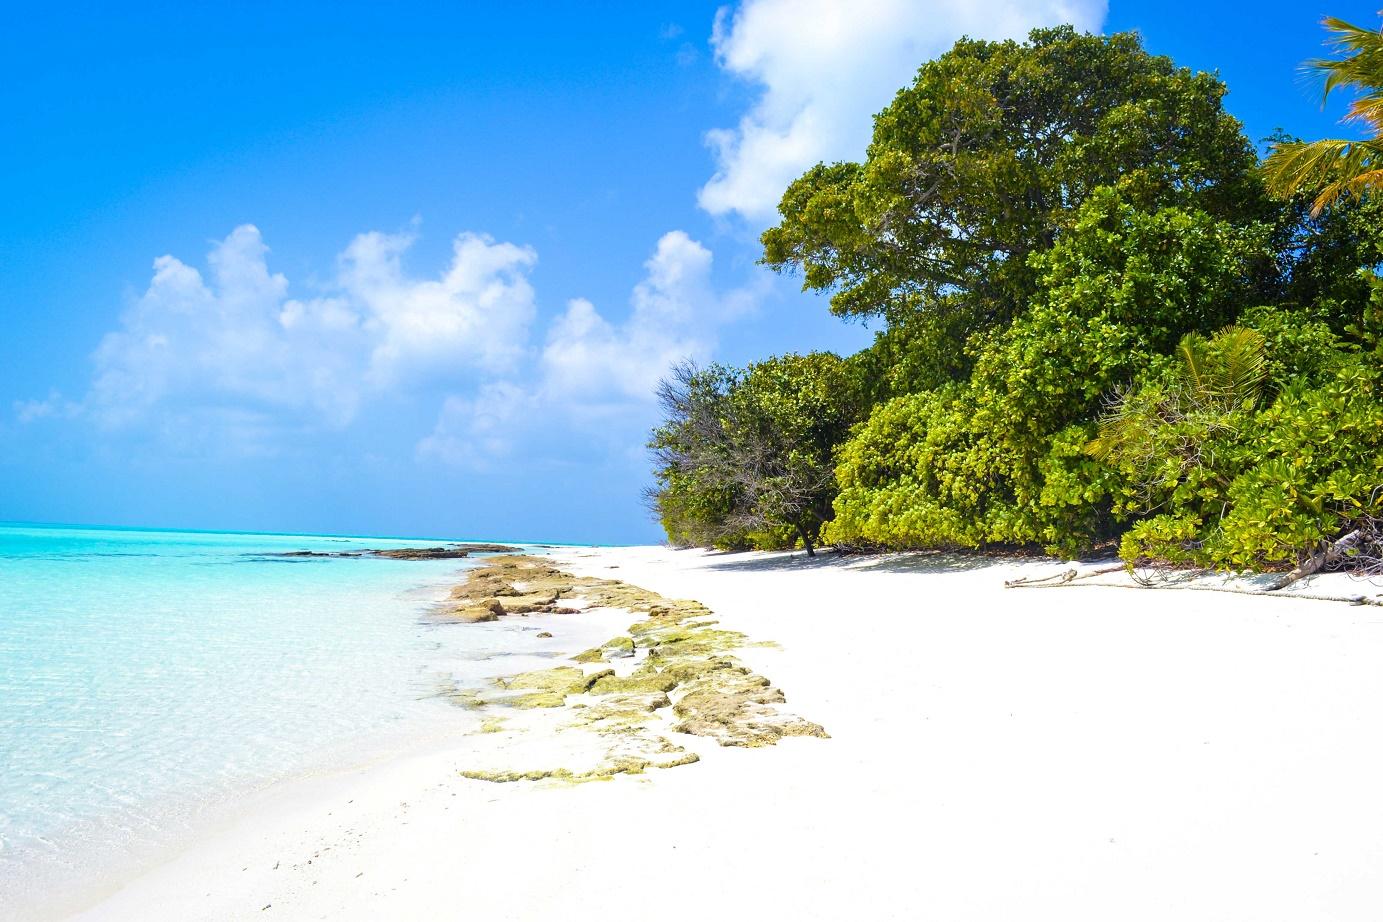 Ostrov pro piknik